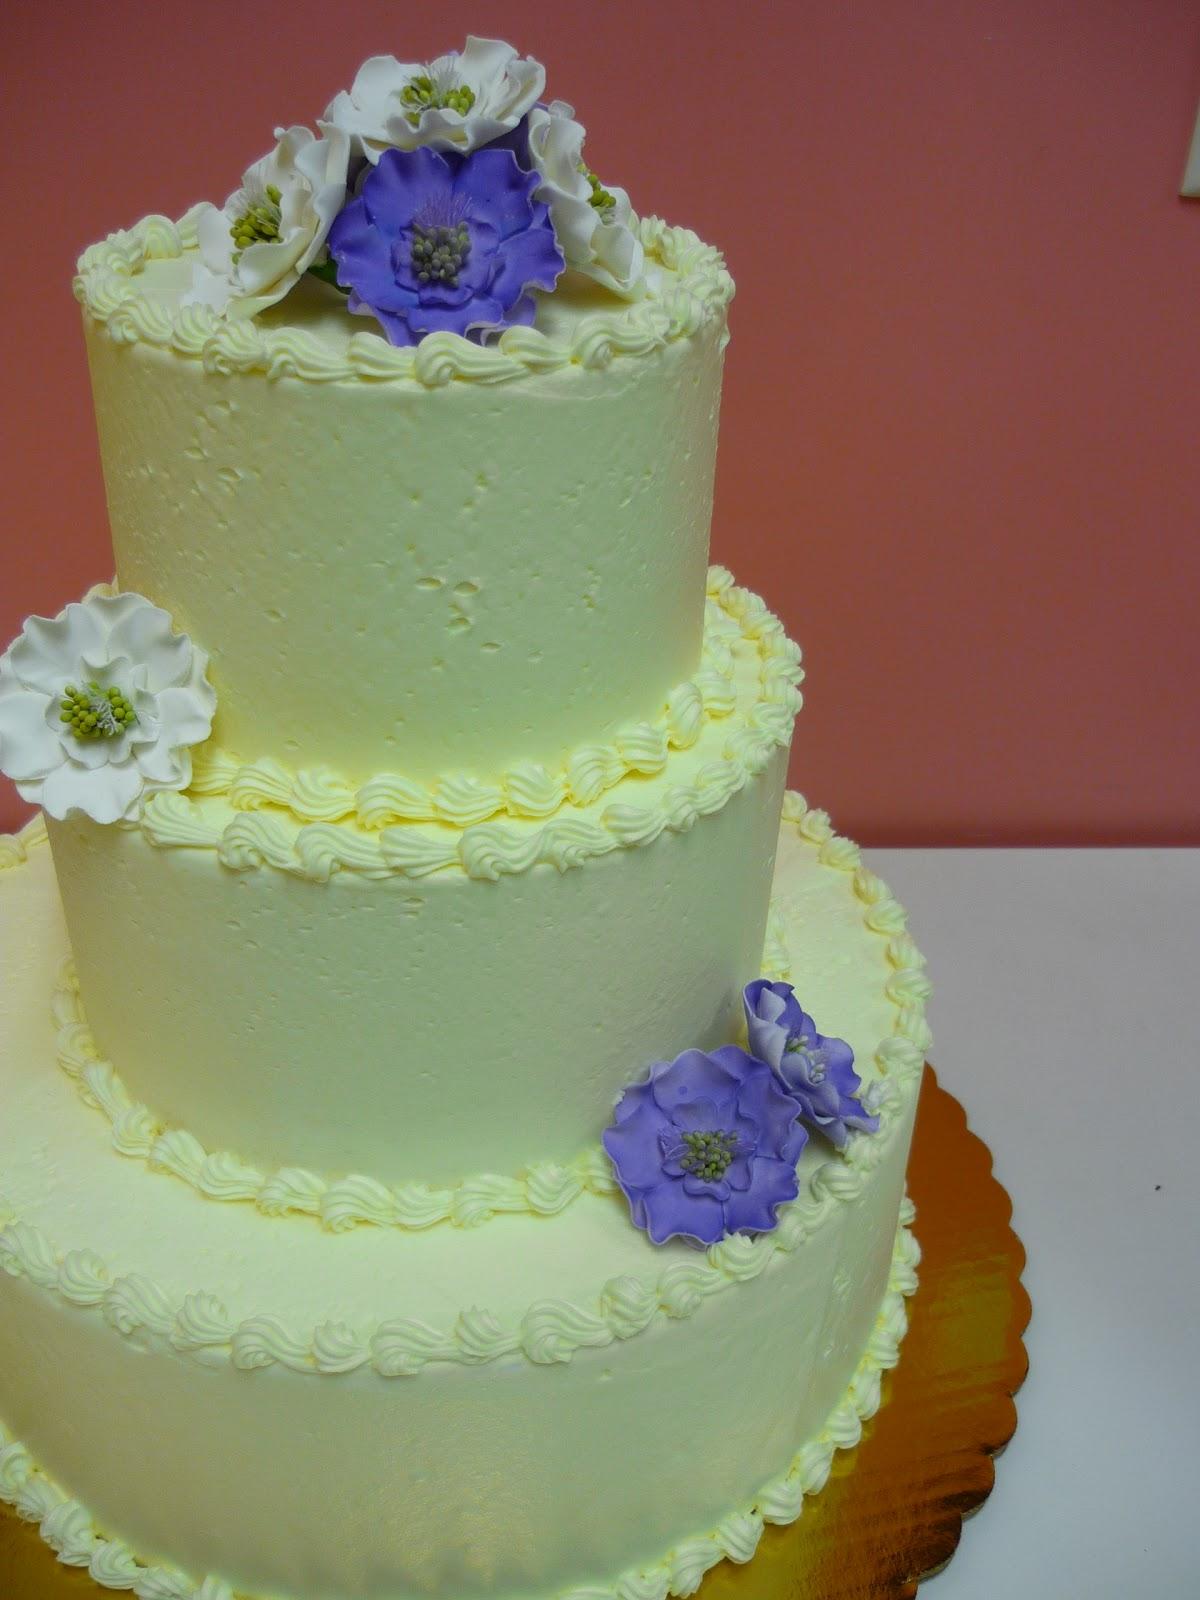 Gluten Free, Vegan, U0026 Dairy Free Wedding Cakes